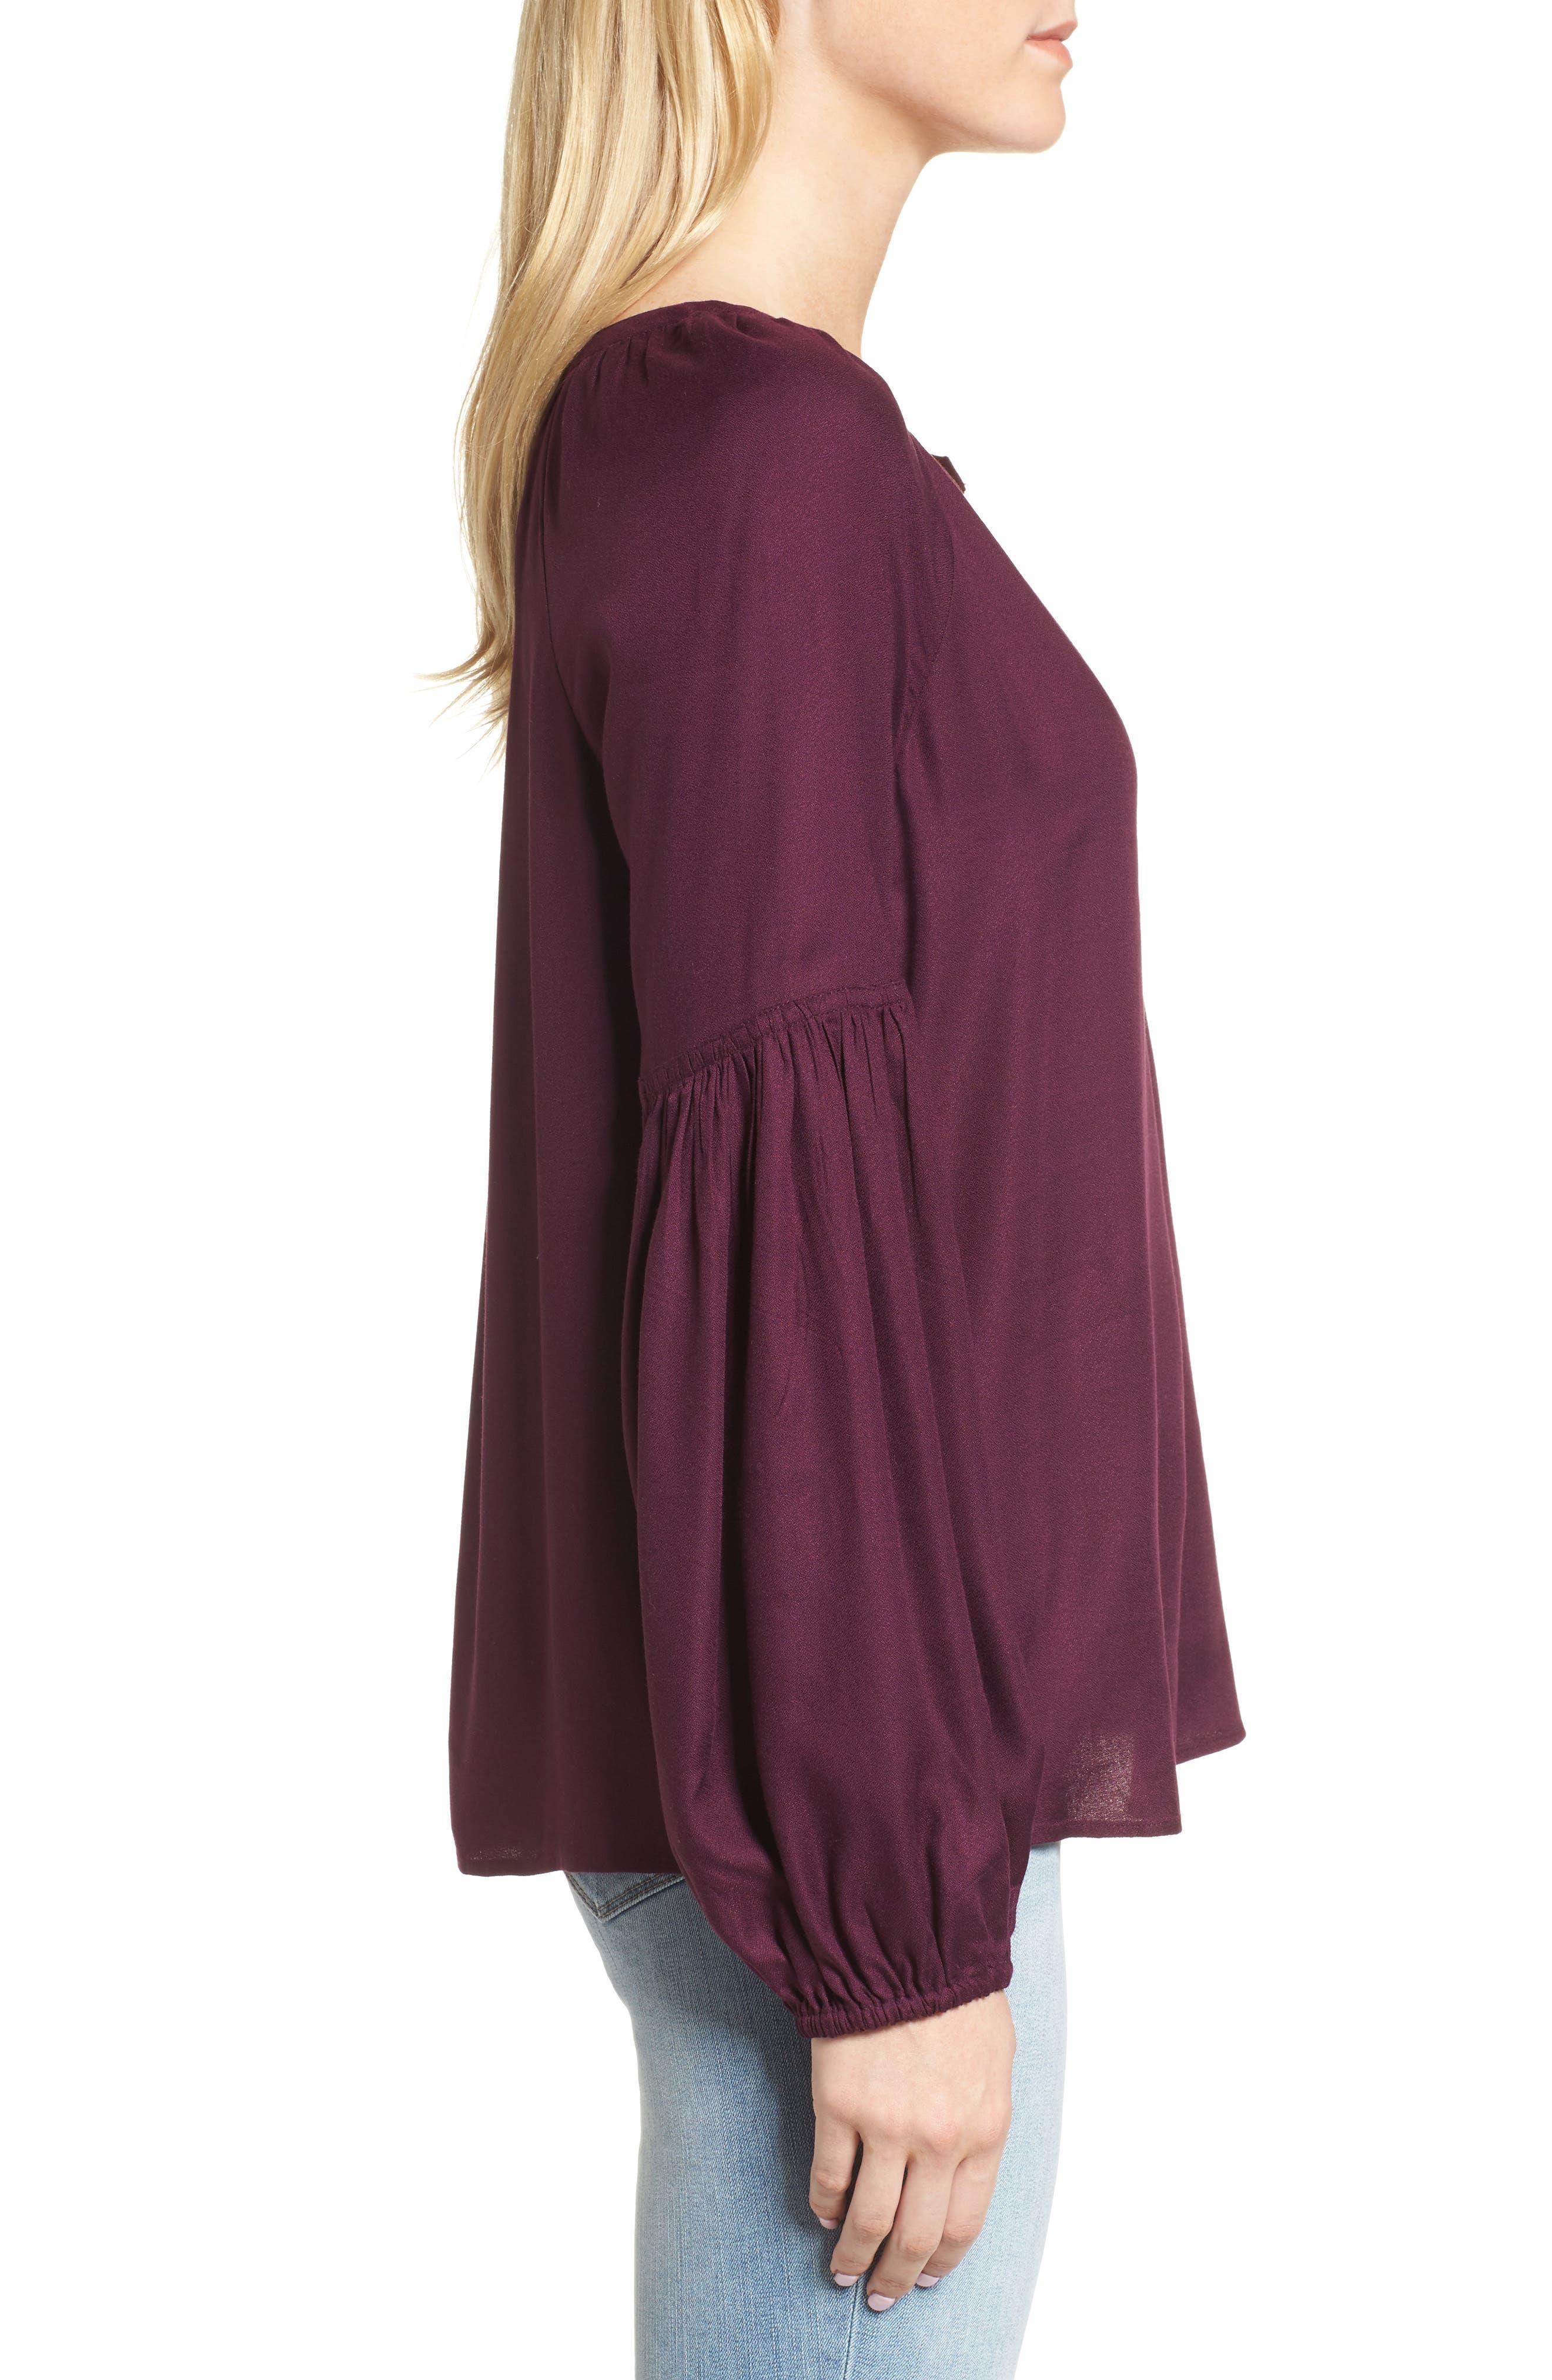 Blouson Sleeve Top,                             Alternate thumbnail 3, color,                             Purple Potent